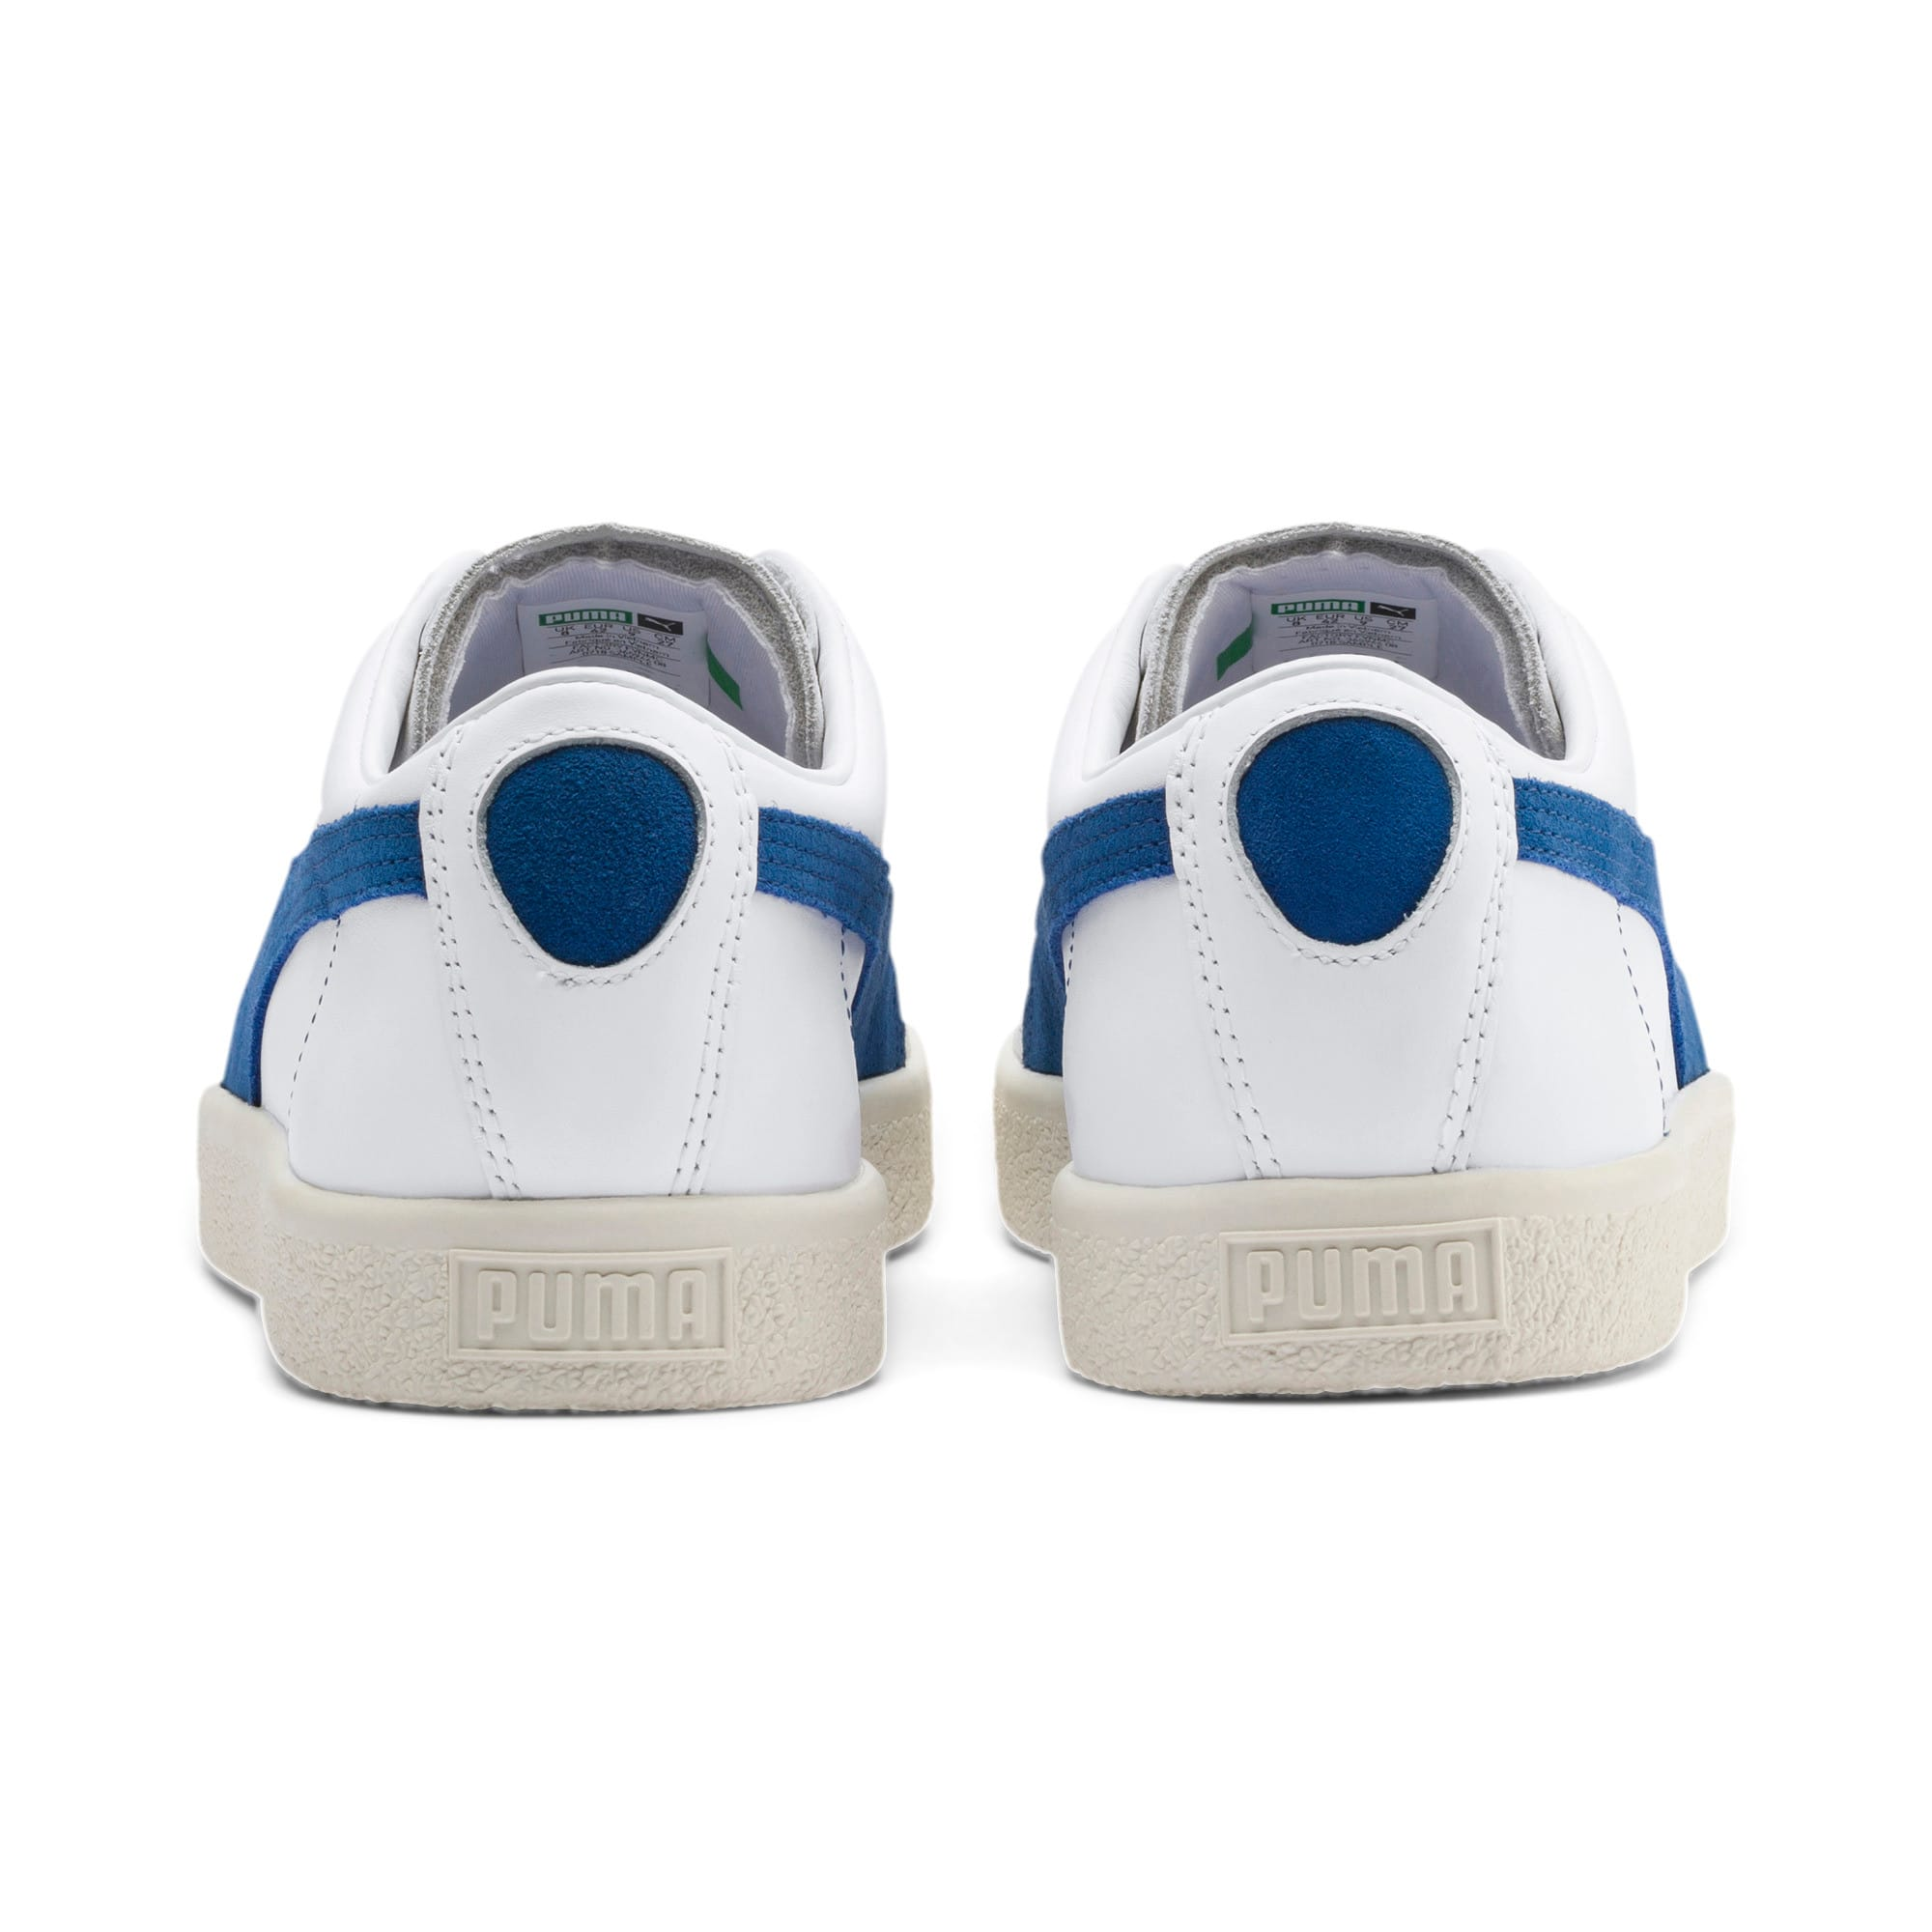 Miniatura 4 de Zapatos deportivosBasket 90680, Puma White-Galaxy Blue-Whisp, mediano